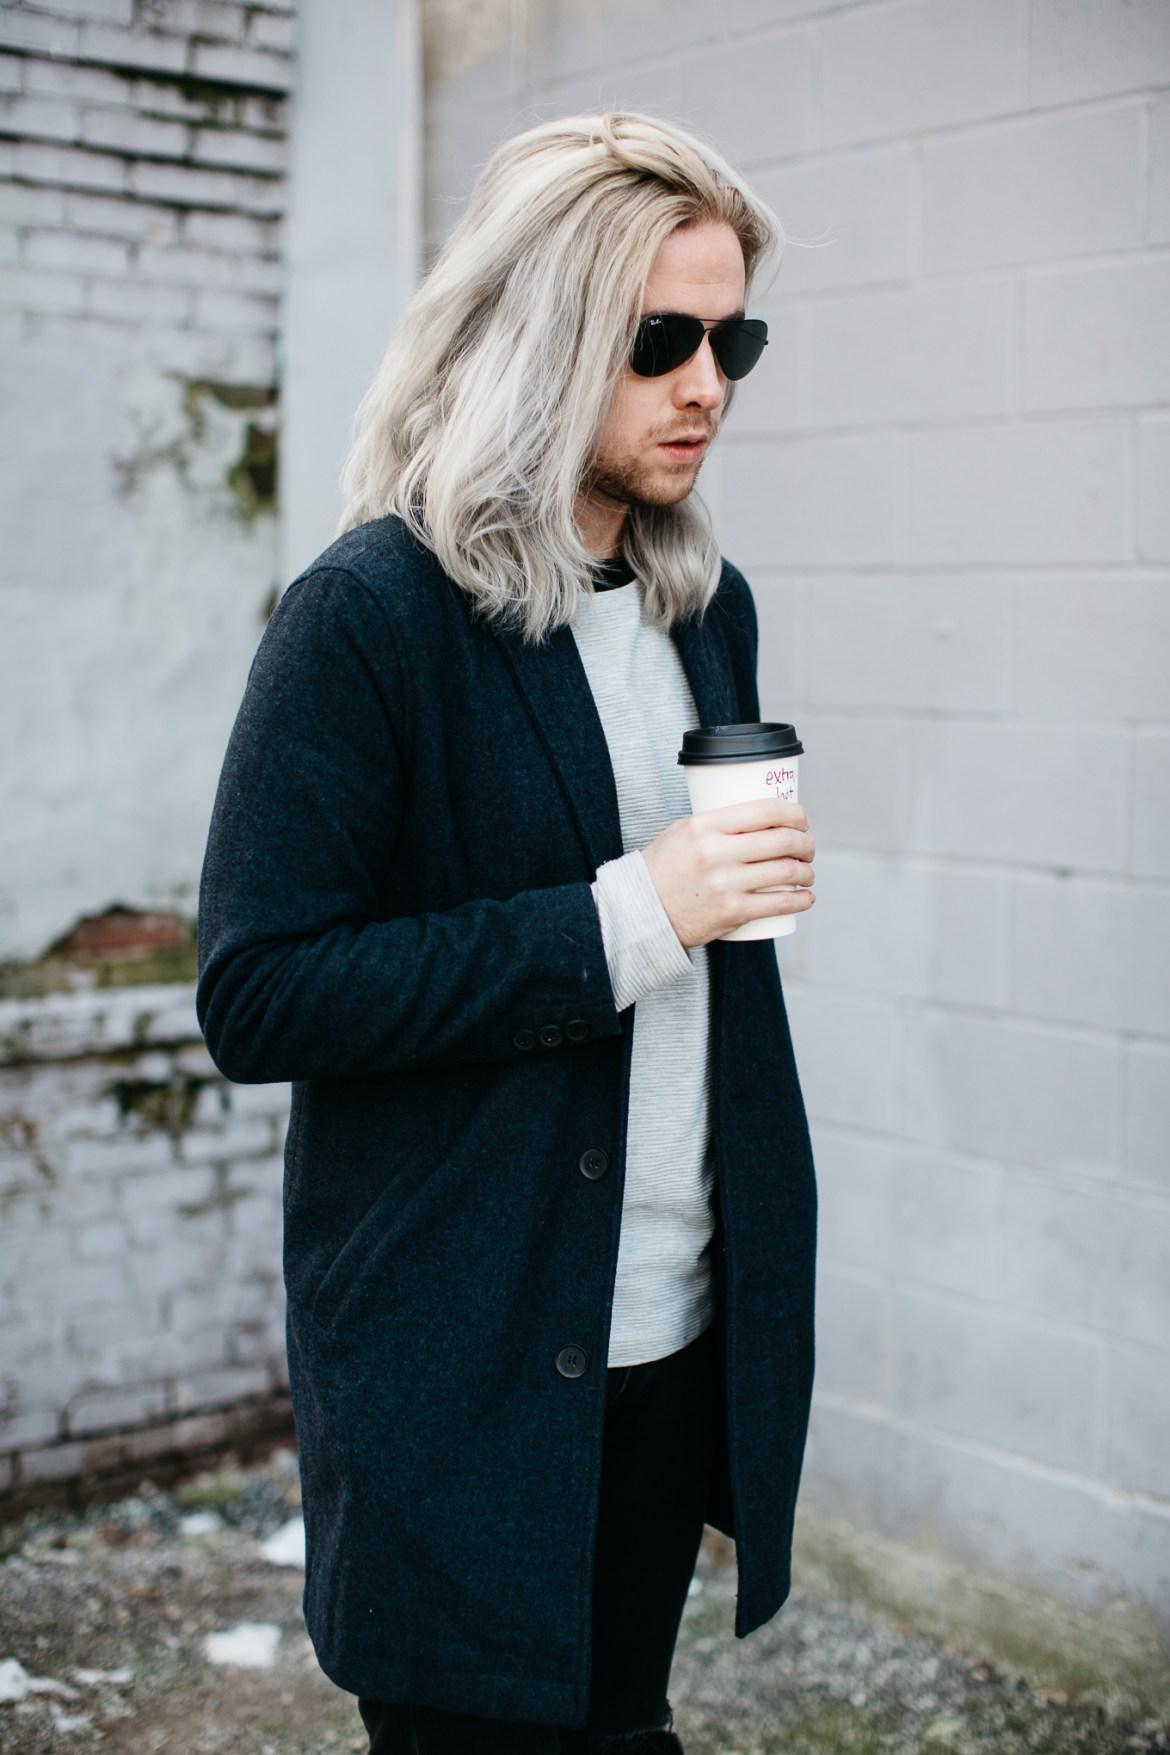 topman, topman selected homme, rag & bone denim, mens fashion blog, mens lifestyle blog